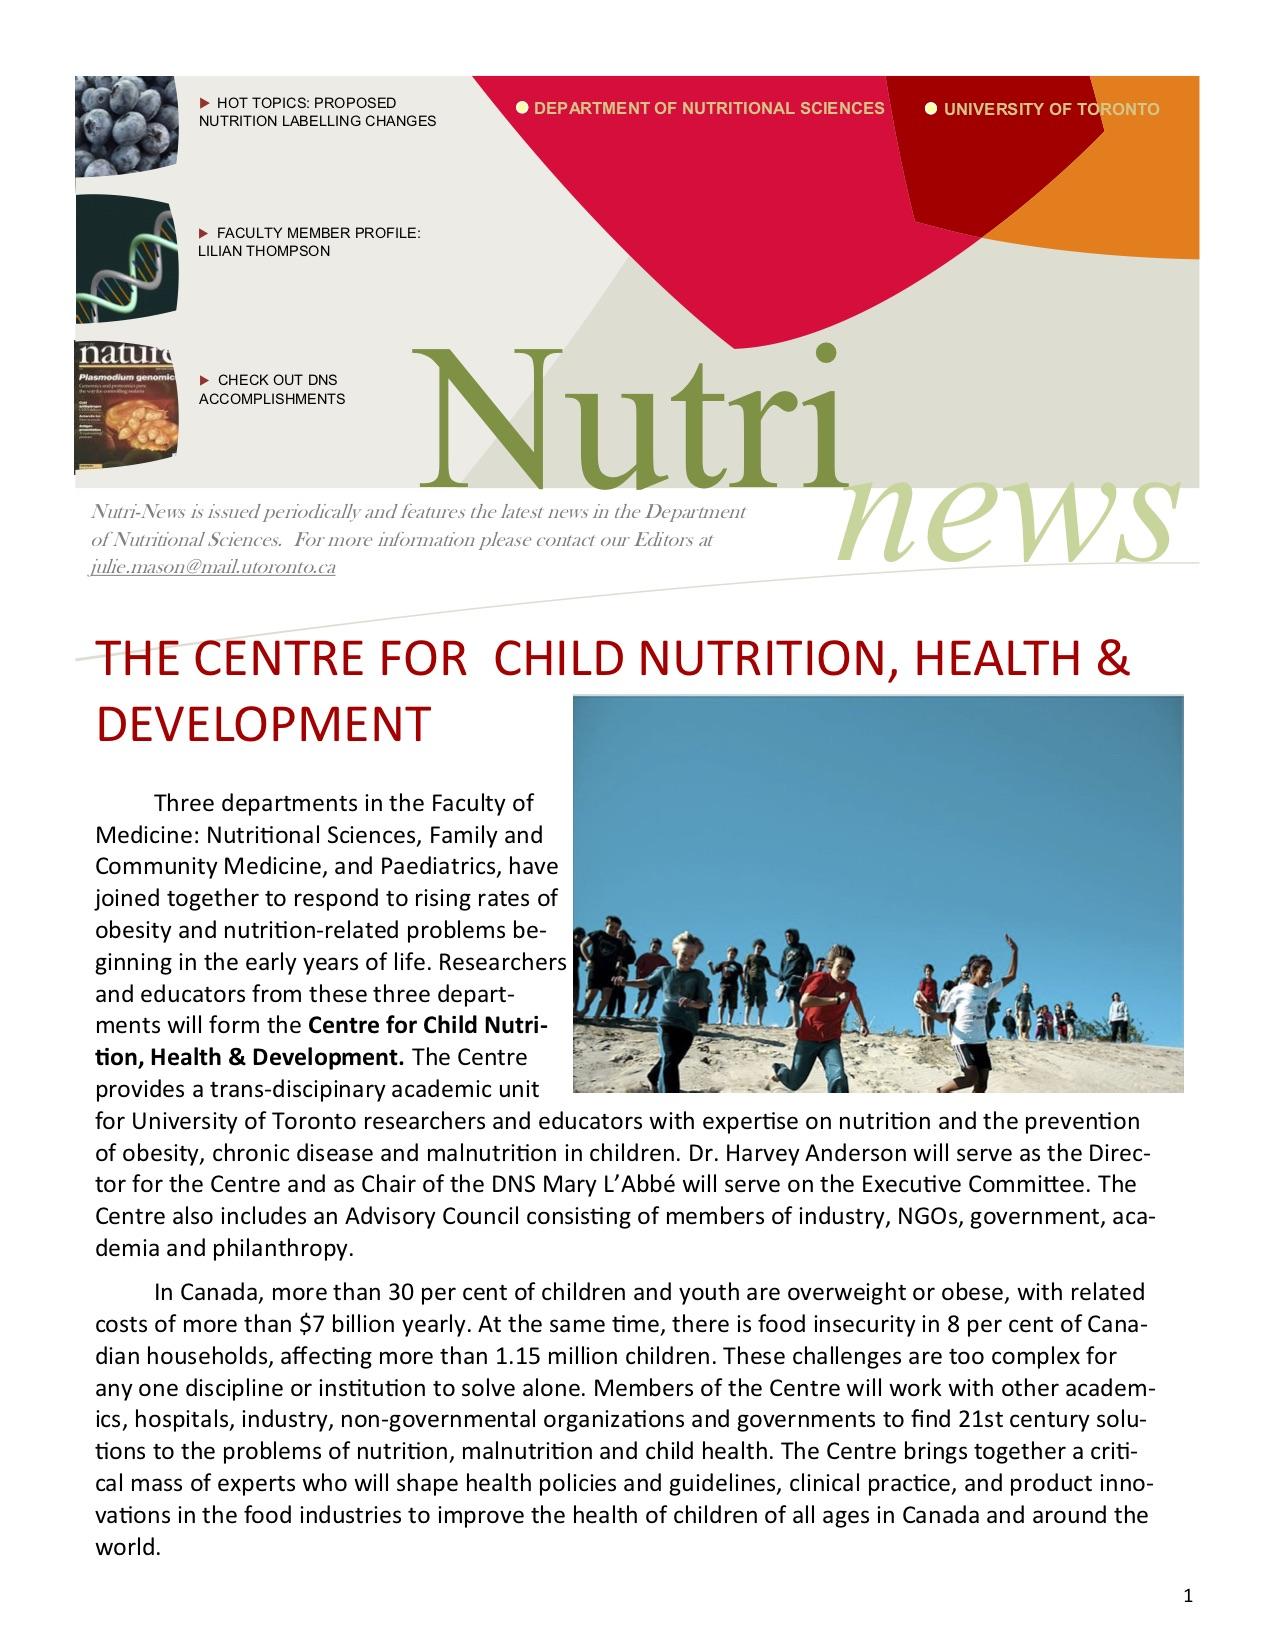 NutriNews Newsletter. 2014 Fall Issue